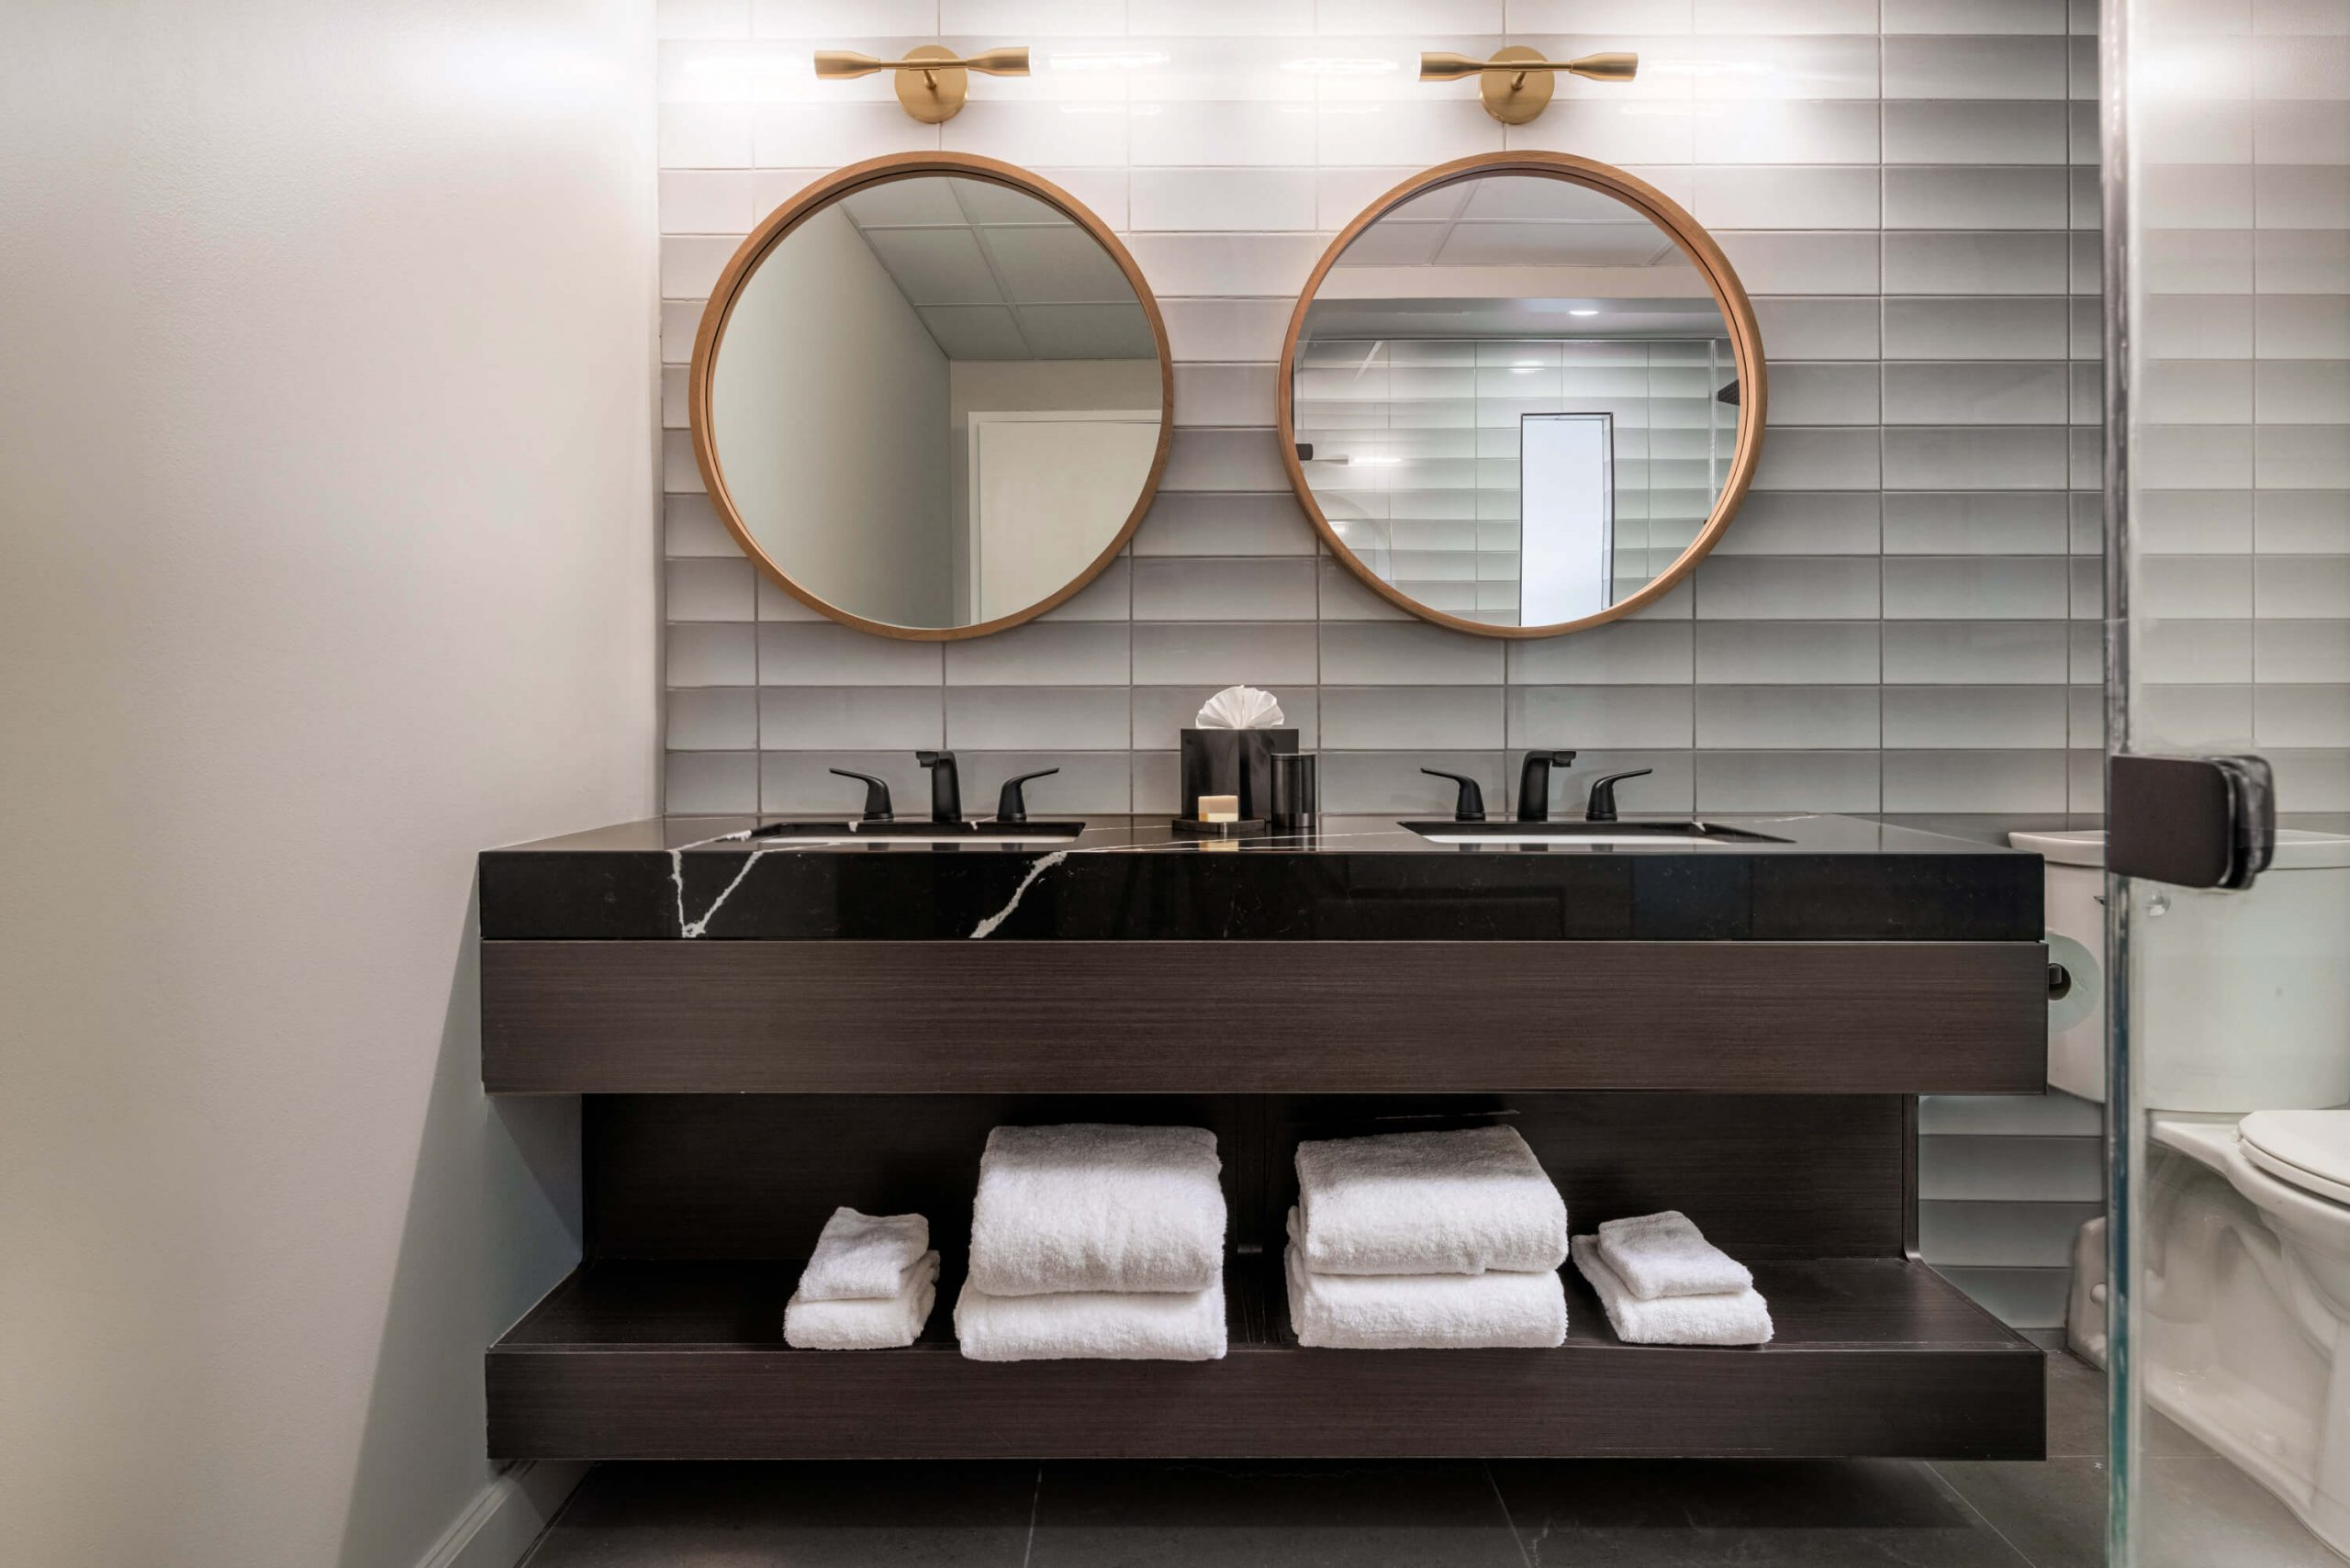 Premier King Suite bathroom